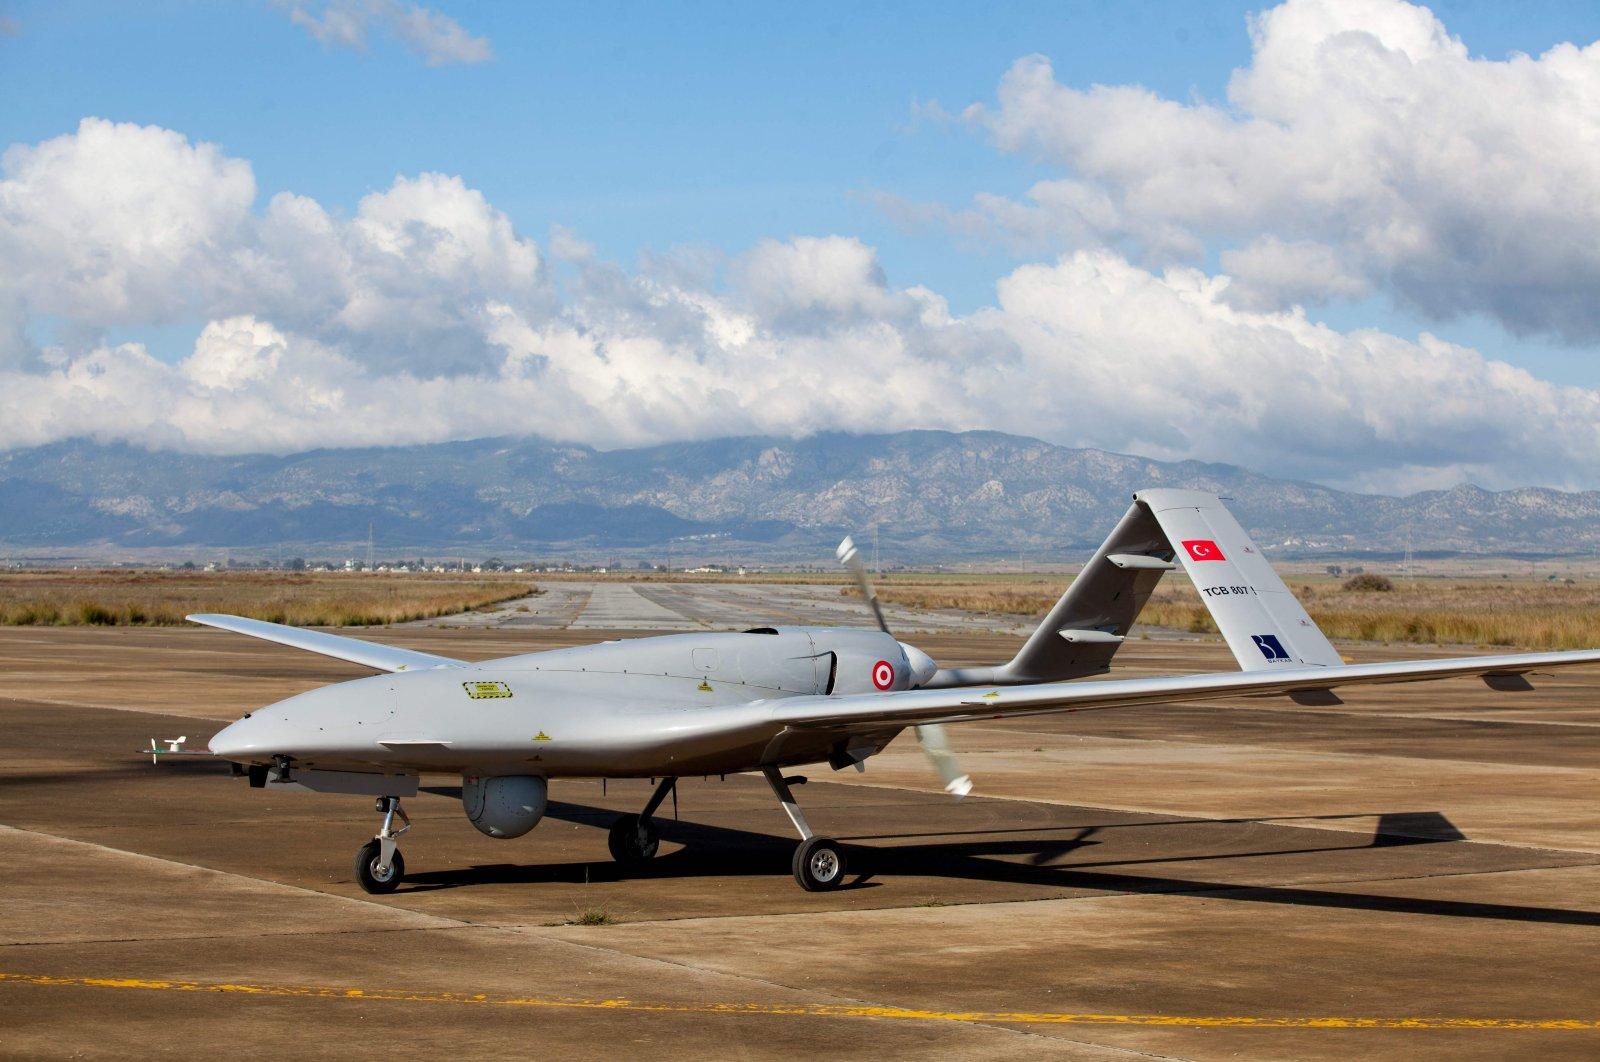 A Turkish-made Bayraktar TB2 drone stands at the Geçitkale military air base near Famagusta, Turkish Republic of Northern Cyprus, Dec. 16, 2019. (AFP Photo)